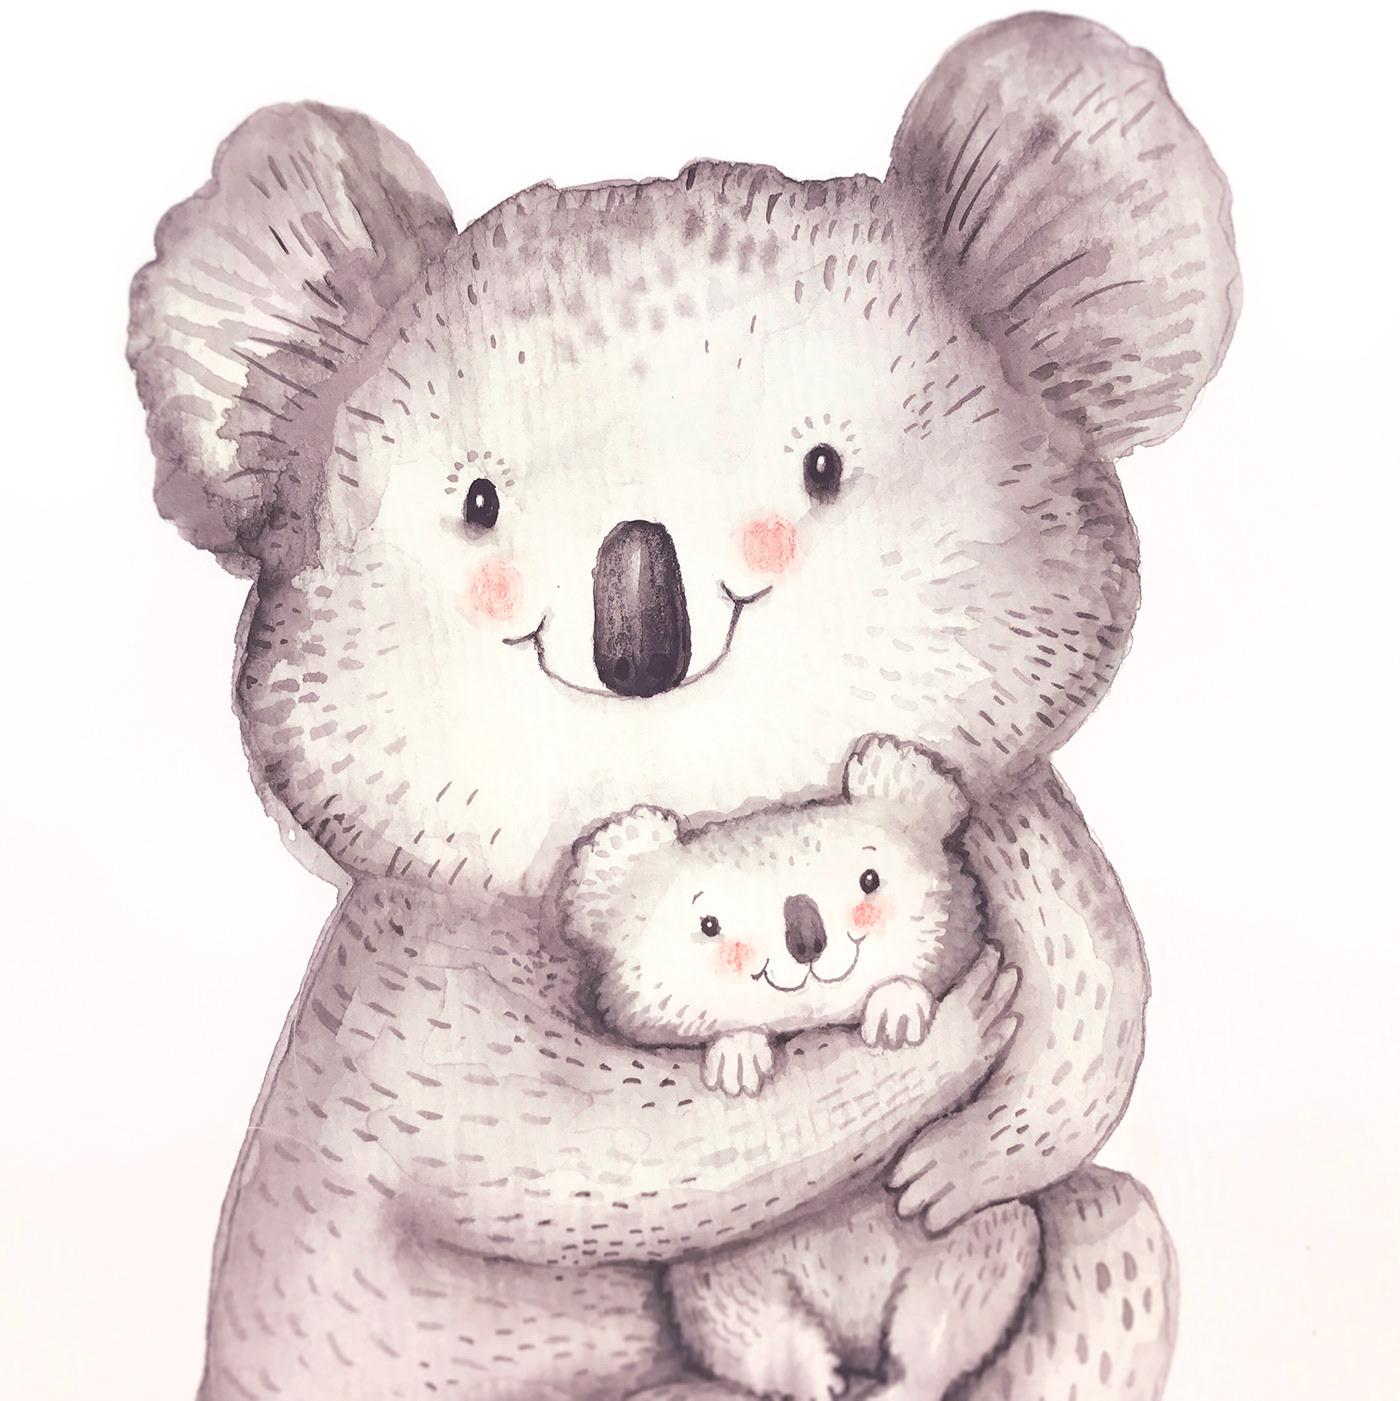 Beautiful Illustrations